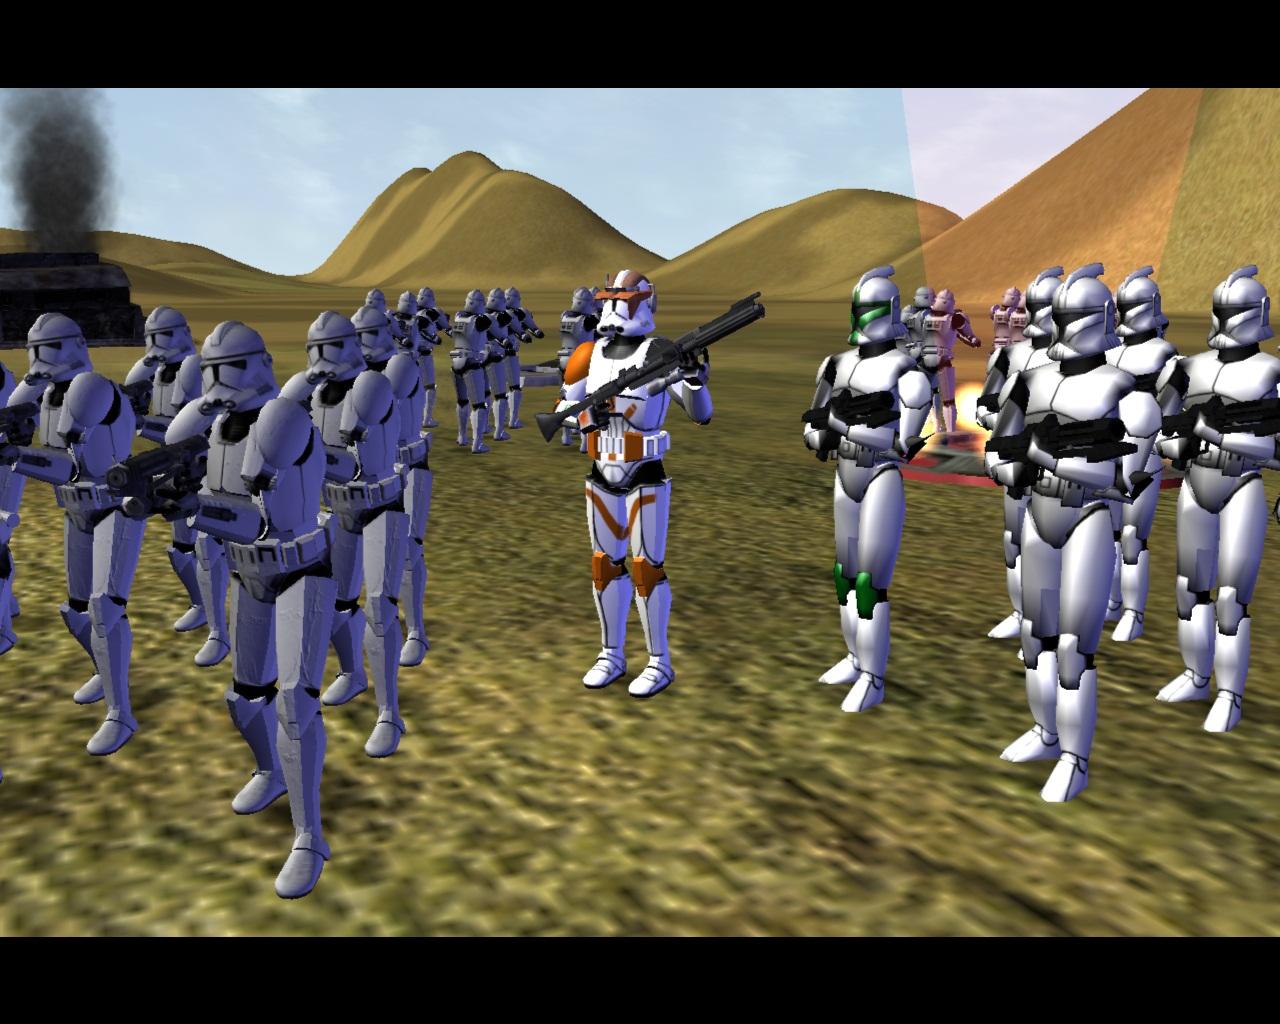 Commander Cody Image Star Wars Clone Wars Sub Mod For